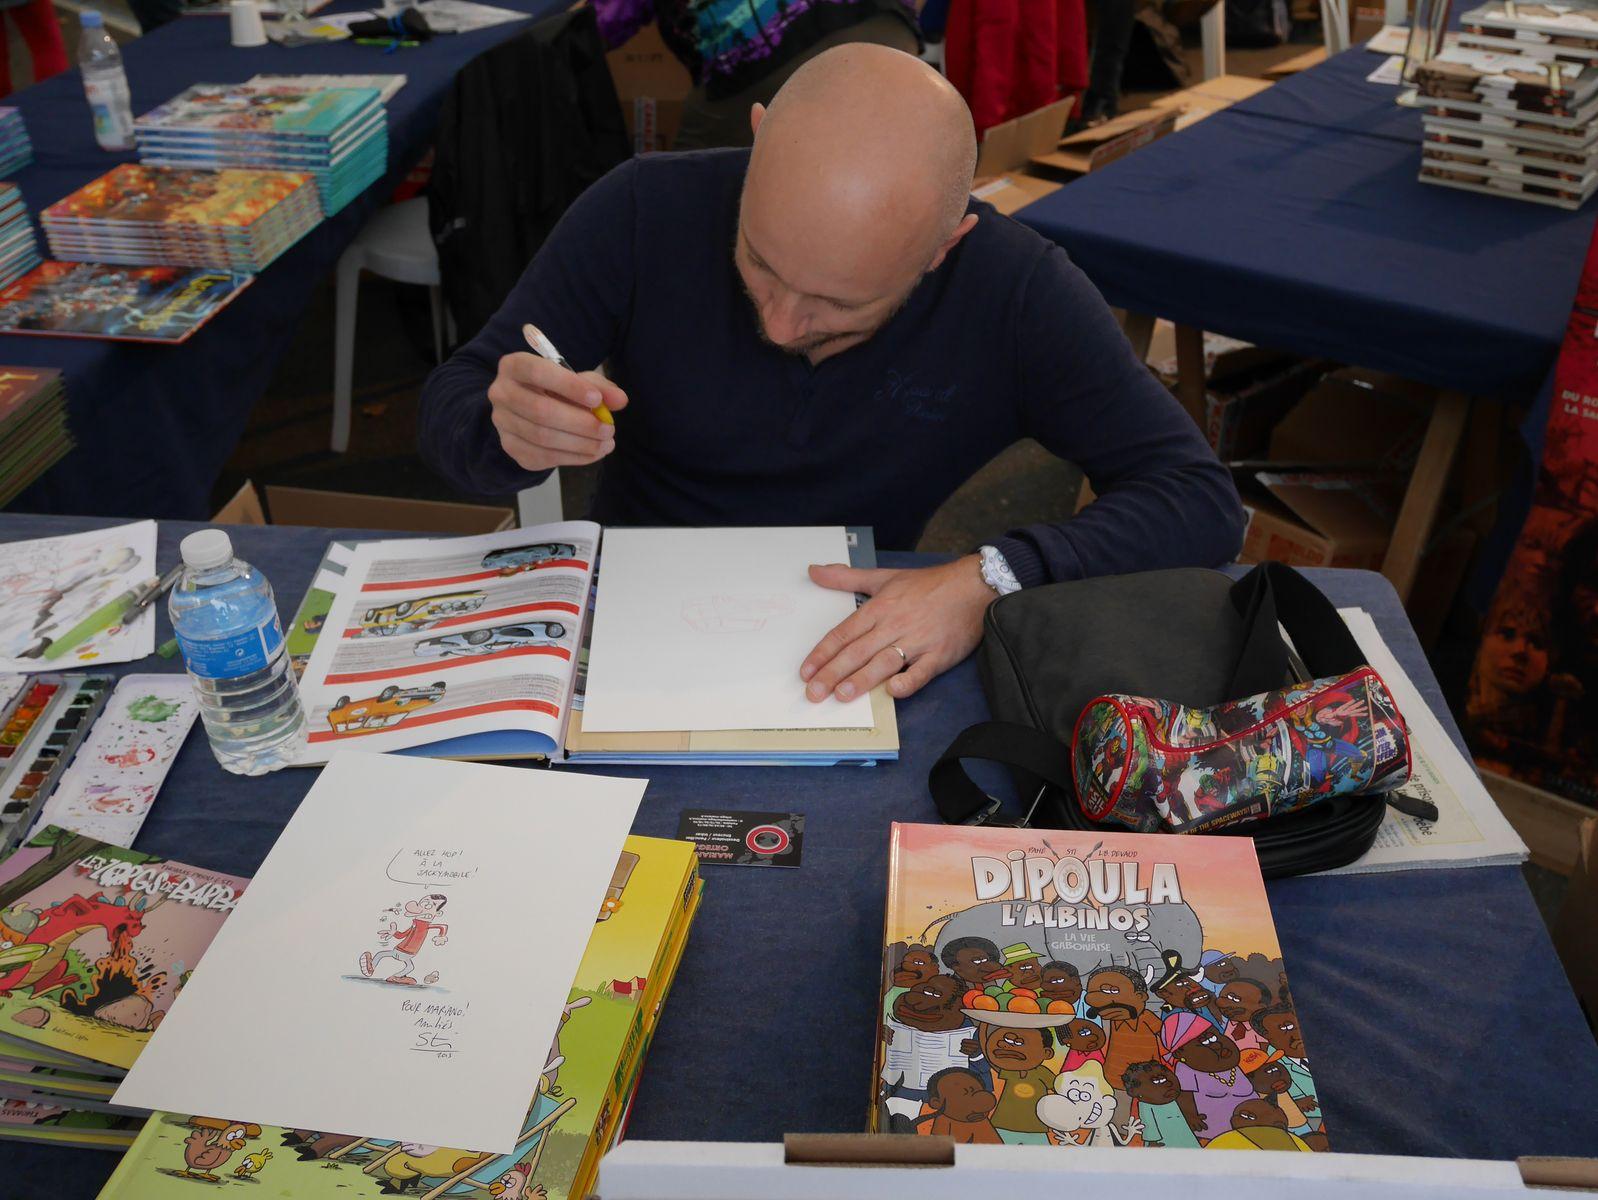 Salon du livre de gaillac 2015 ortega mariano - Salon du livre gaillac ...